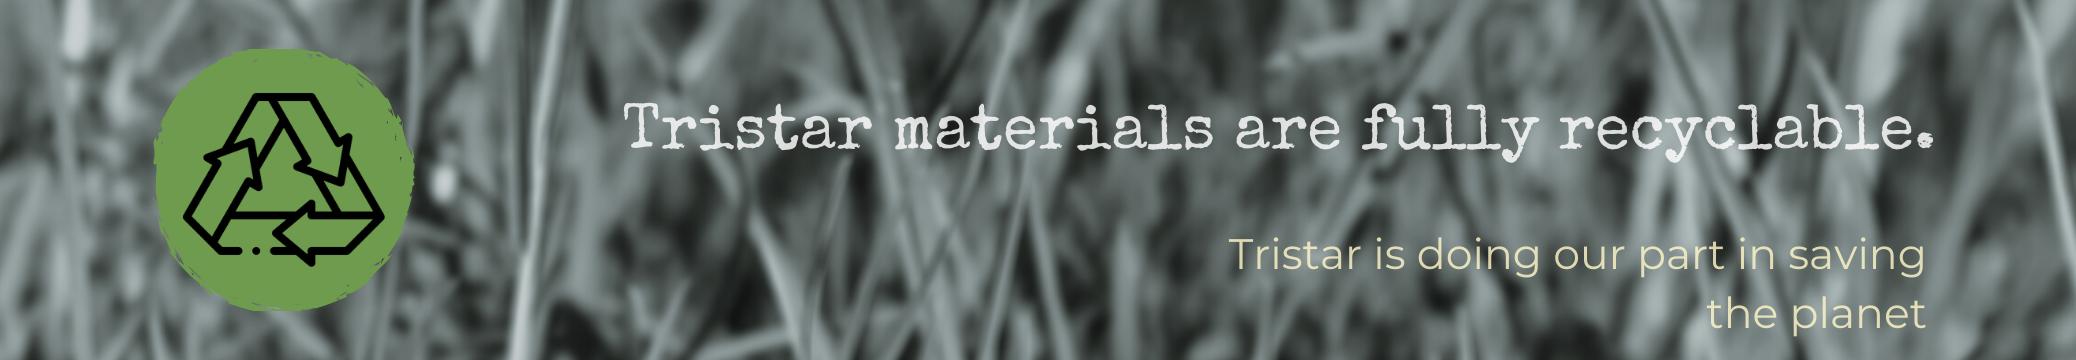 TRISTAR-Aligner Material